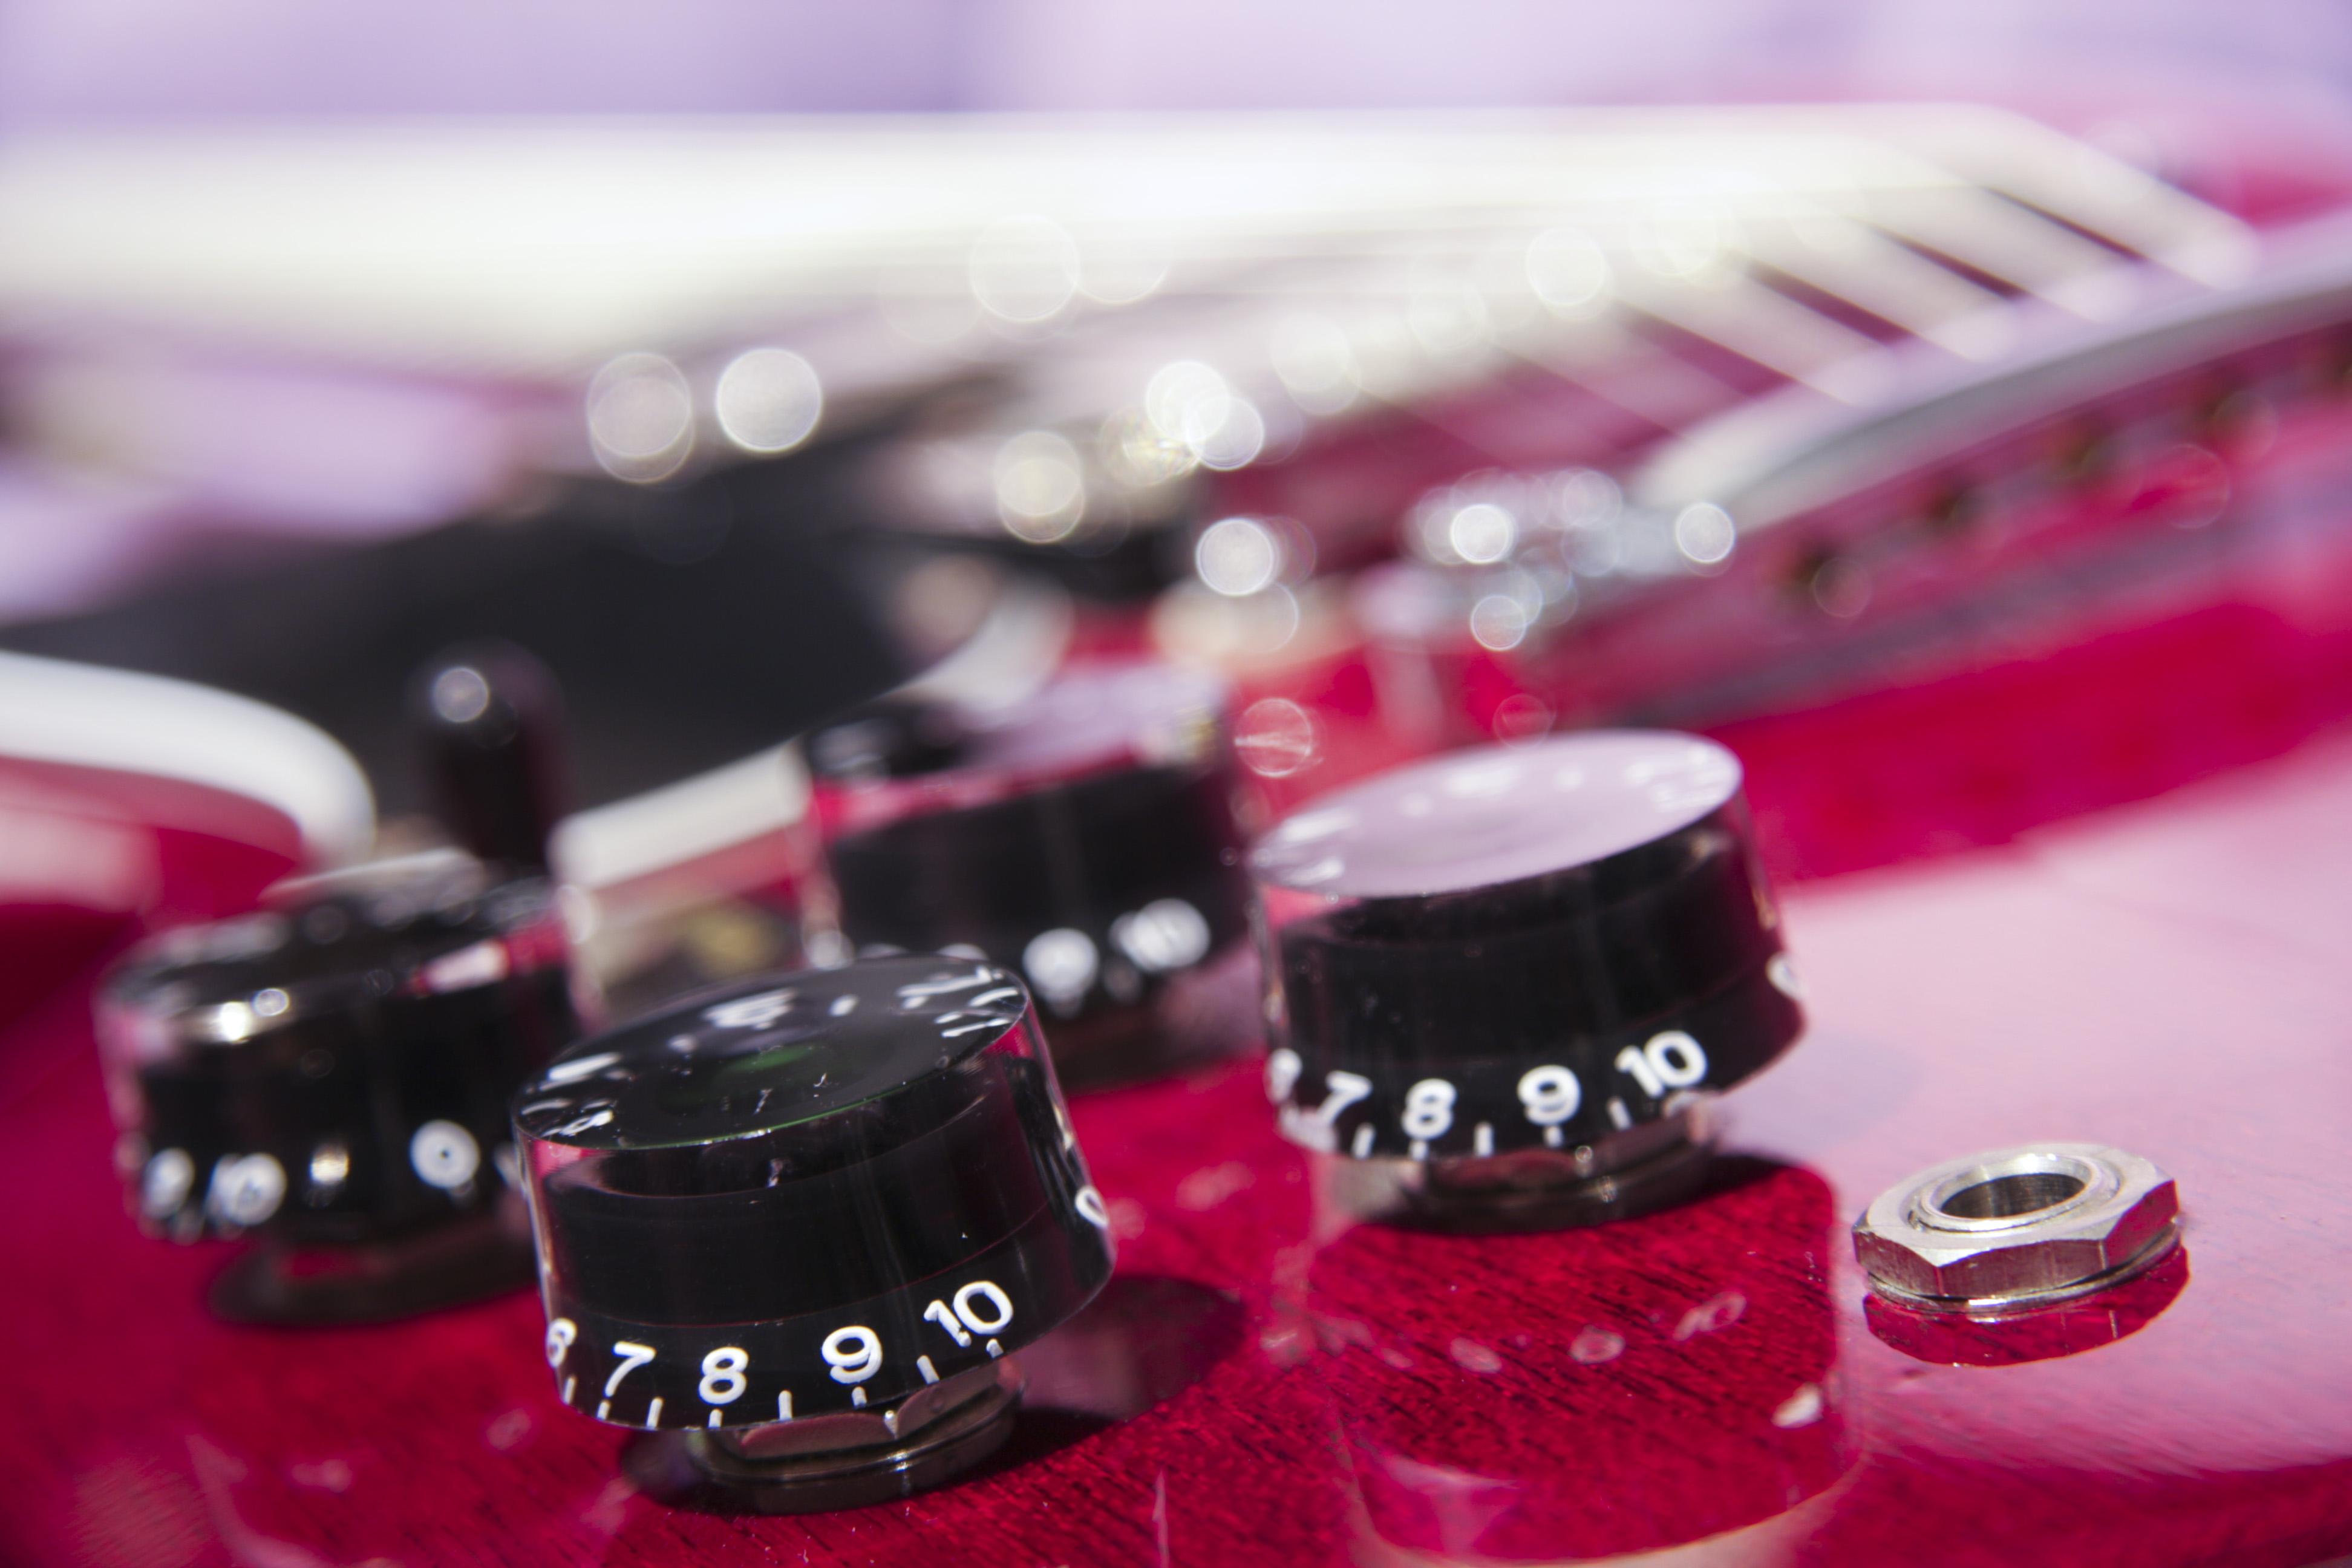 What Guitars Do You Own Page 4 Gearslutz Way Switch Neck Volume Bridge Tone Etc Here Agile Al3000 Guitar Img 0415 1 0422